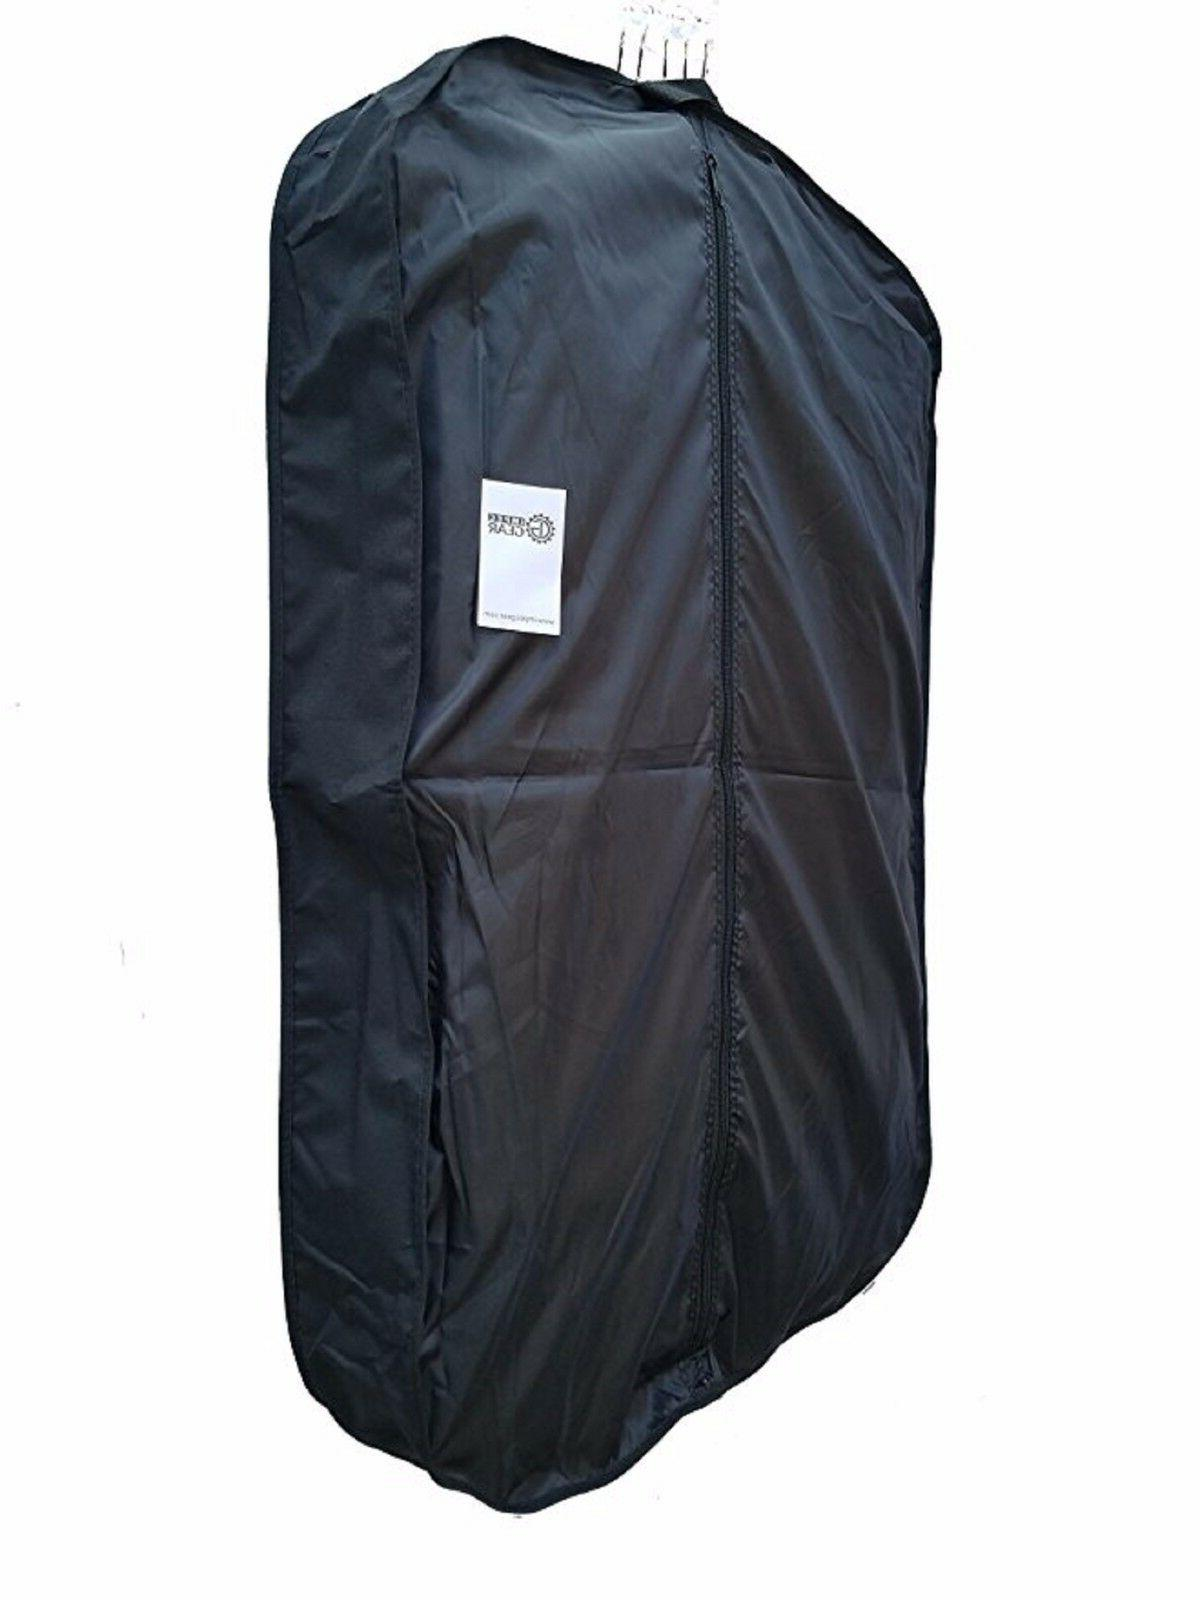 Deluxe Zipped Garment Travel Bag 39x24 Storage